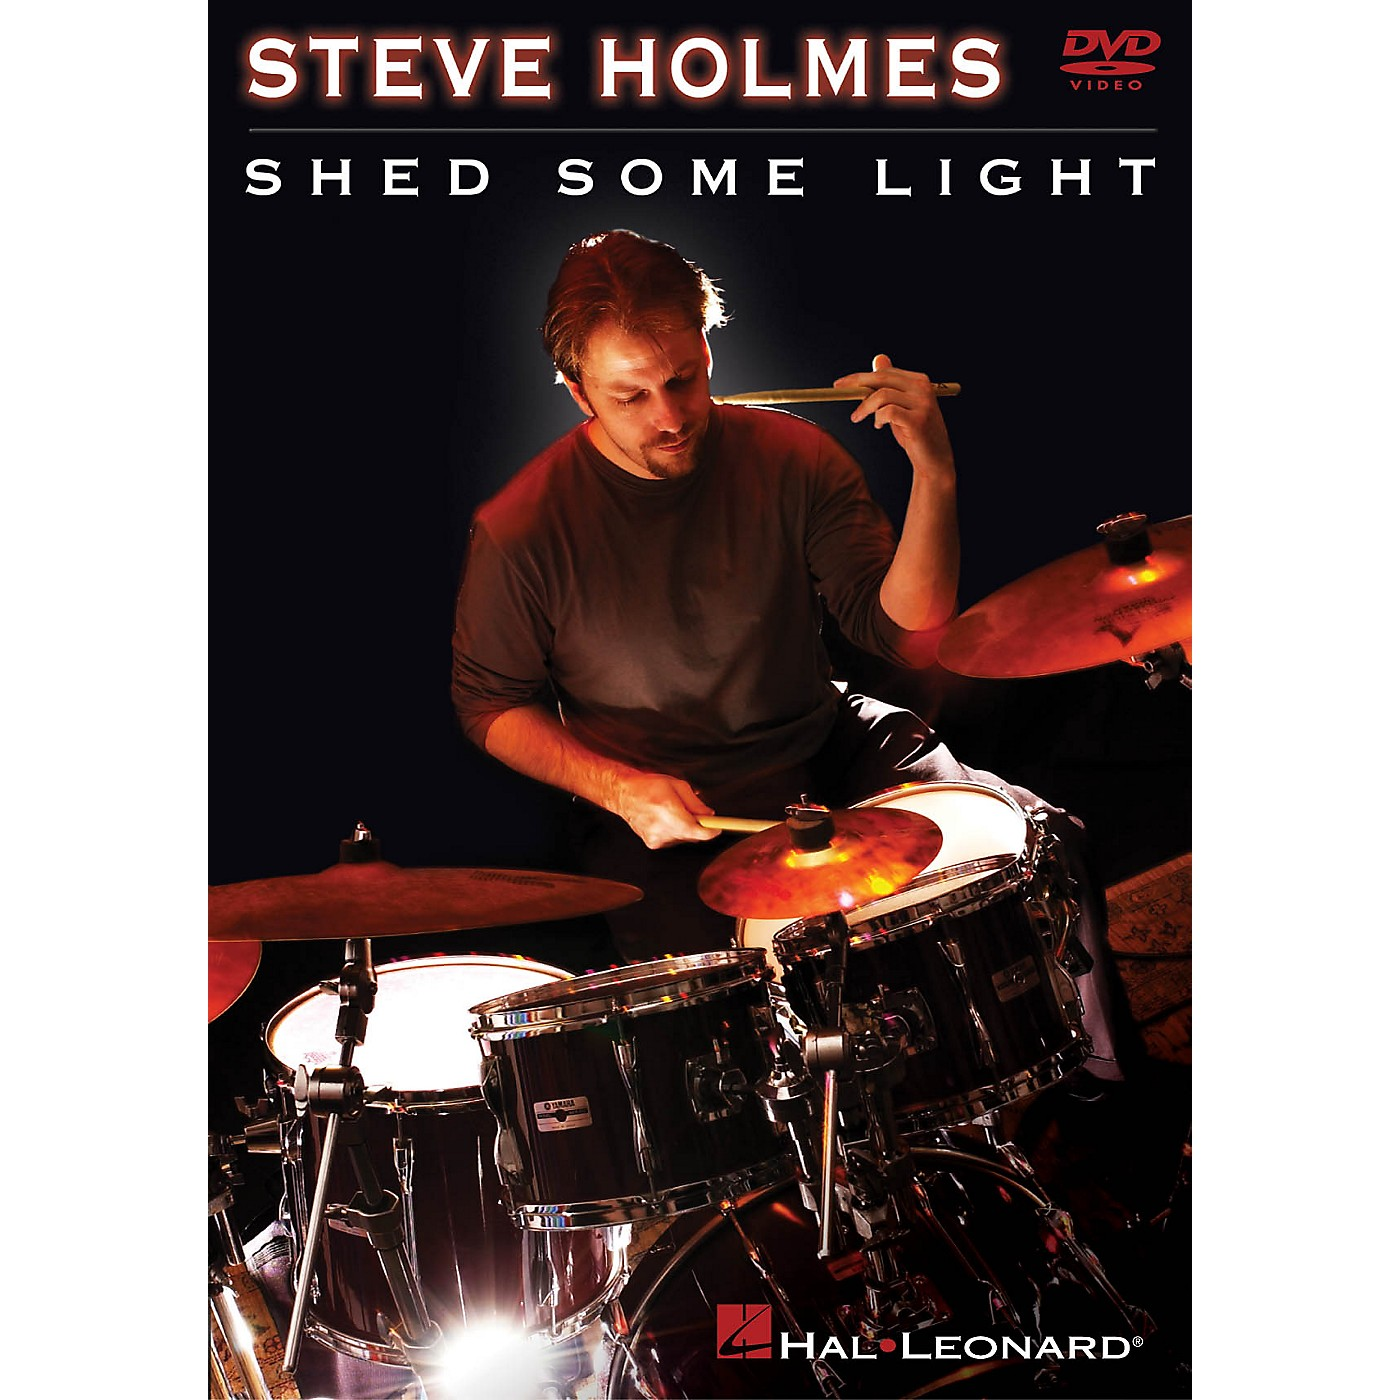 Hal Leonard Steve Holmes - Shed Some Light Instructional/Drum/DVD Series DVD Performed by Steve Holmes thumbnail